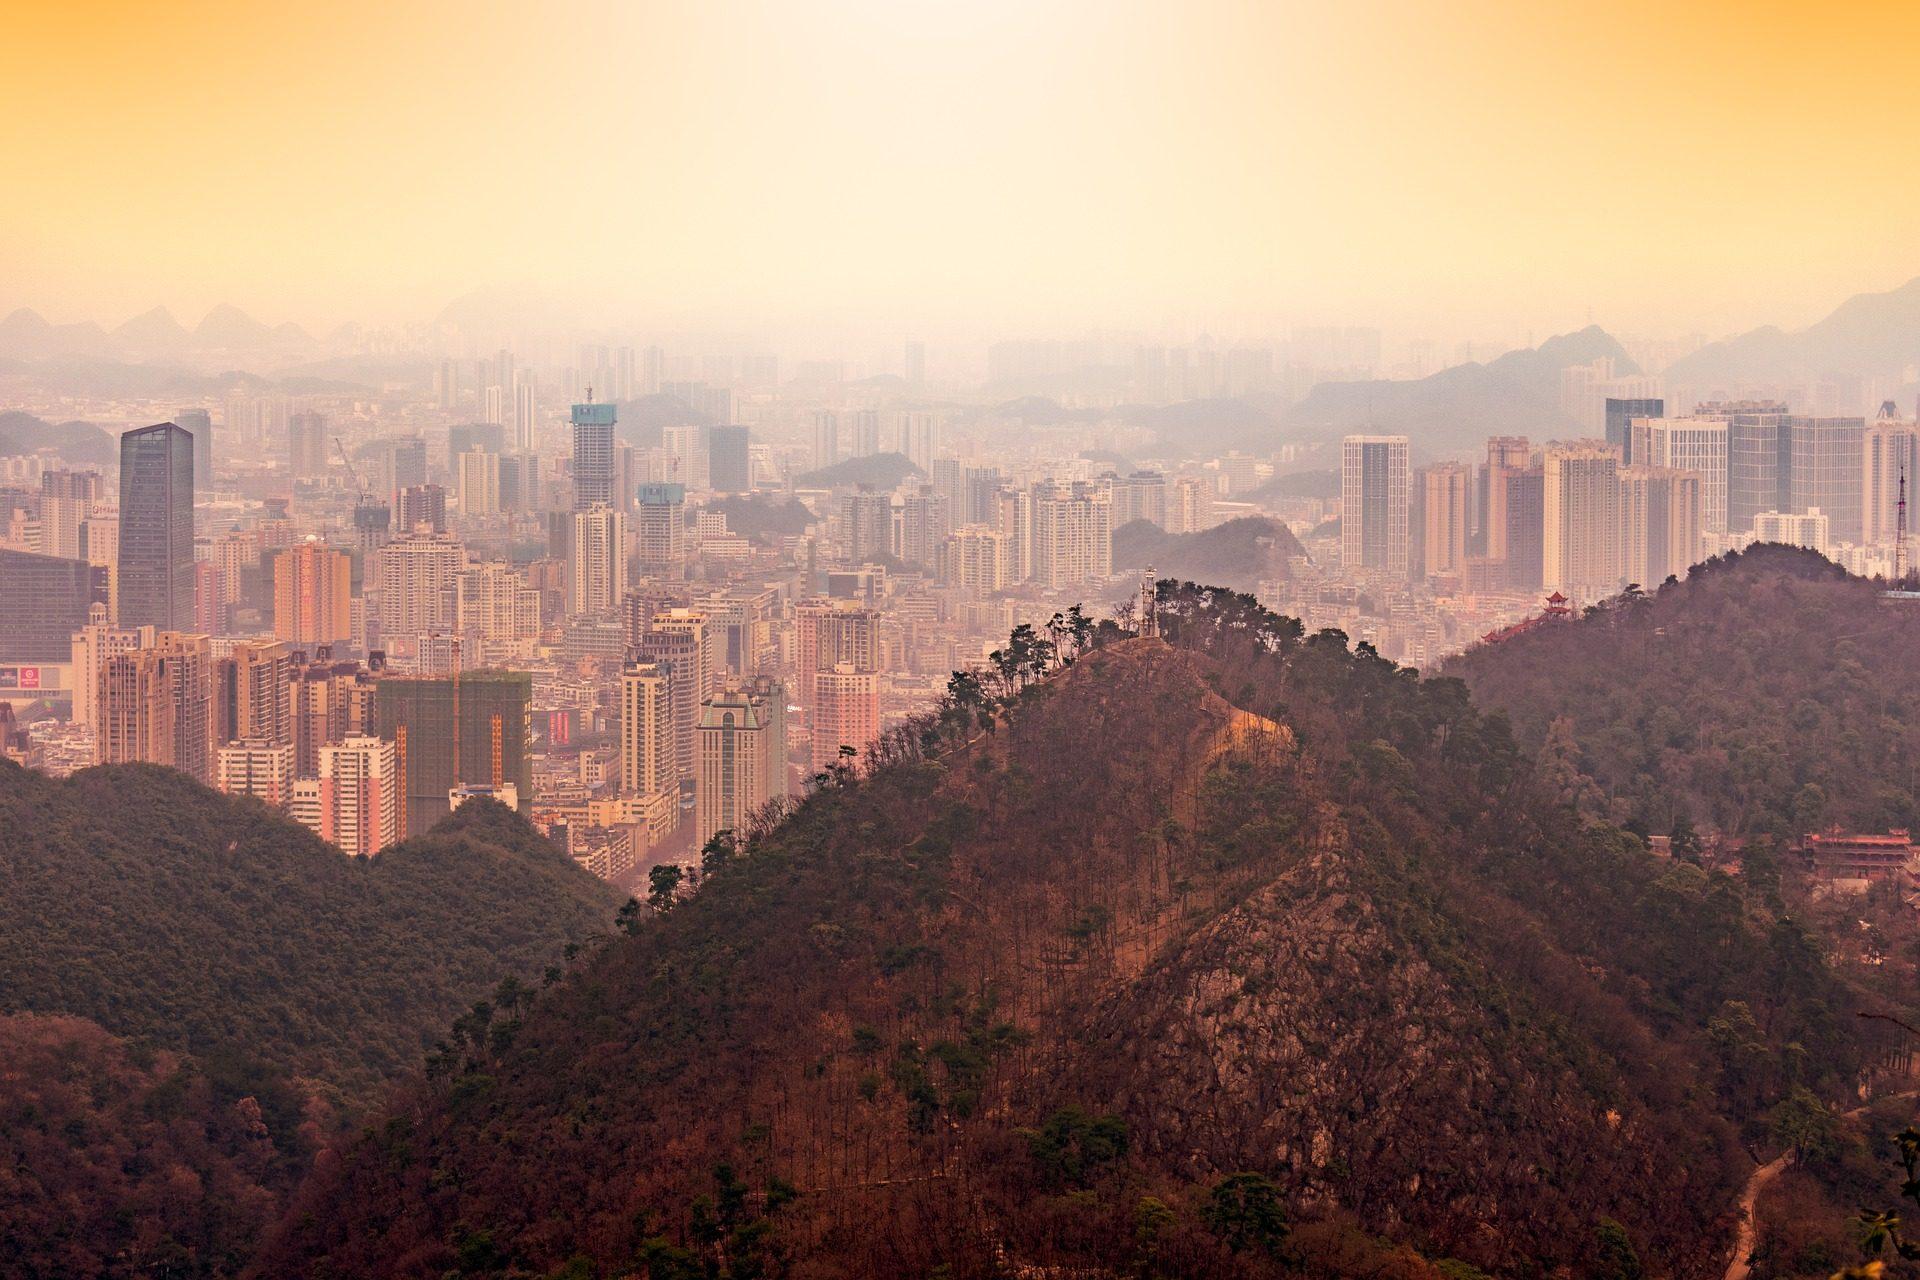 Città, edifici, grattacielo, Montañas, alberi, Guiyang - Sfondi HD - Professor-falken.com